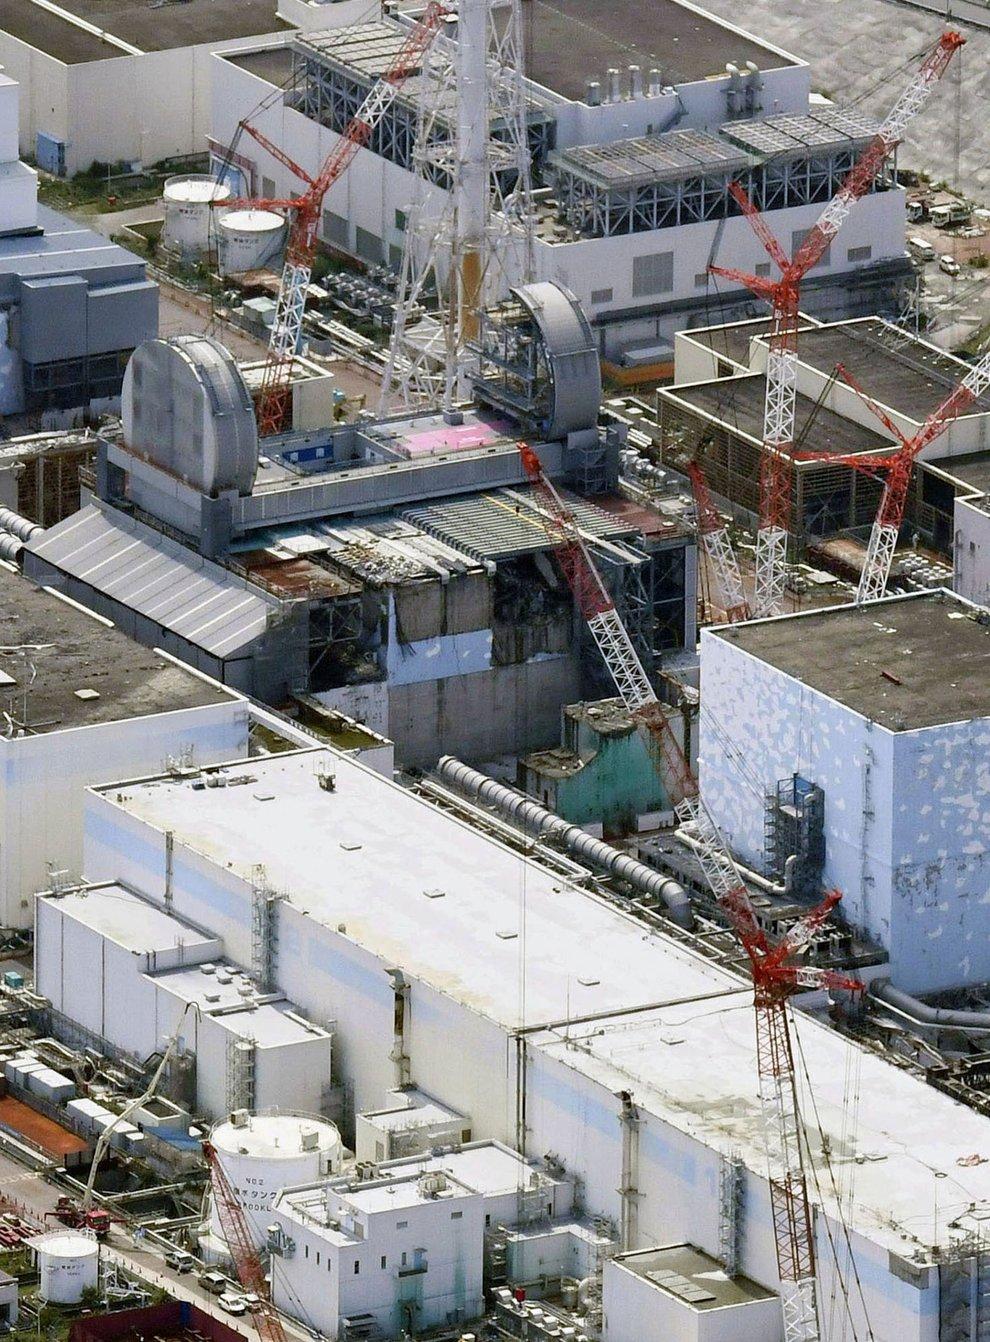 The Fukushima reactor